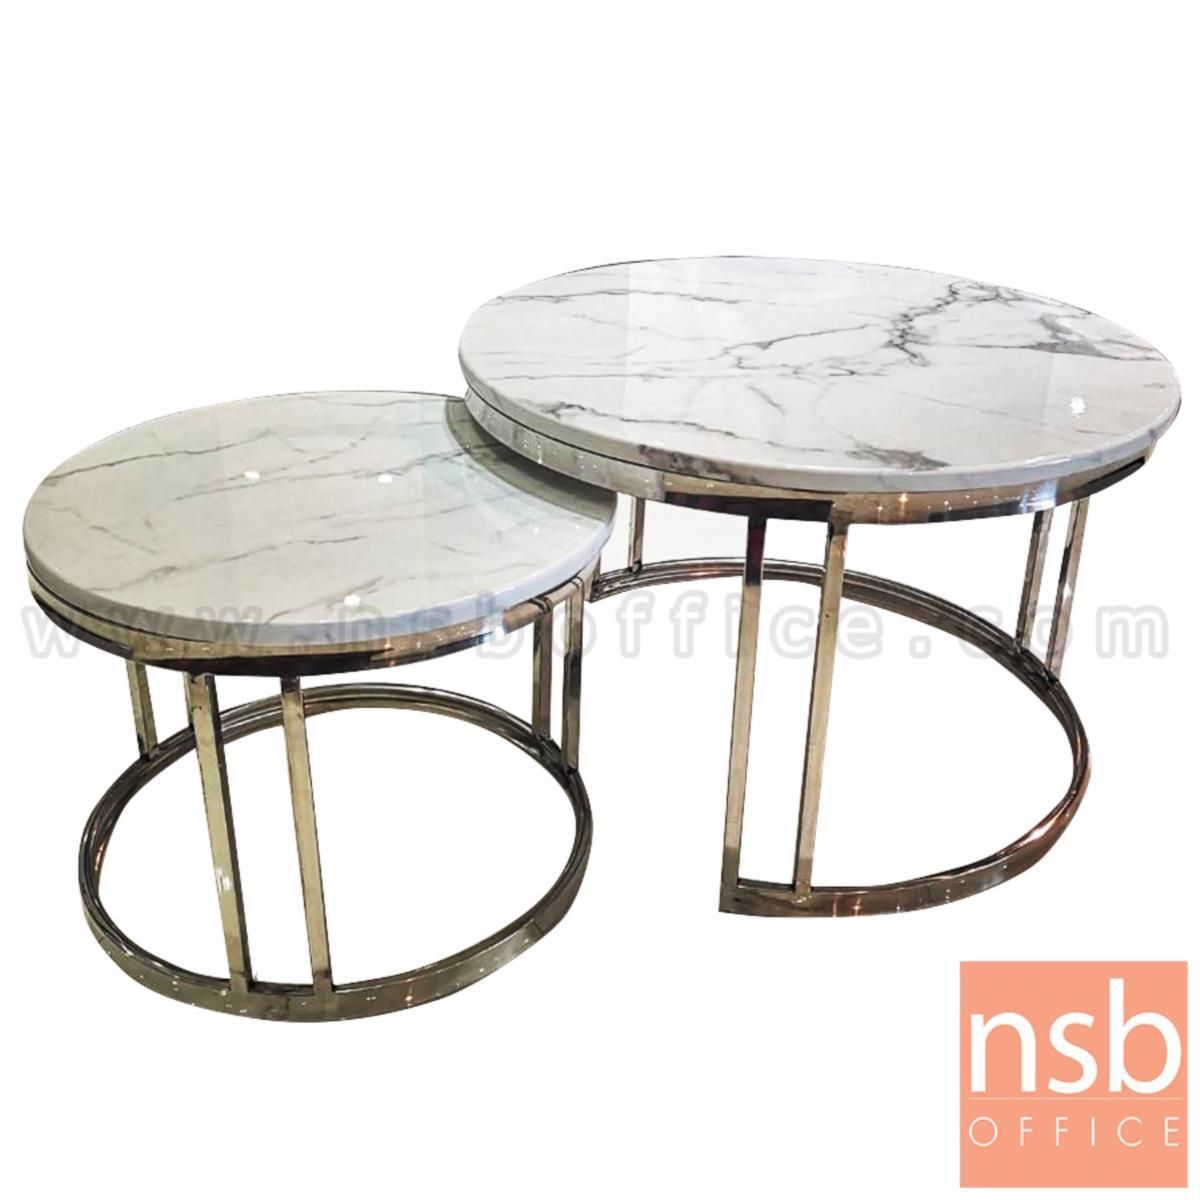 B13A286:โต๊ะกลางหินอ่อน รุ่น Mariska (มาริสก้า)  ขาสแตนเลสสีเงิน